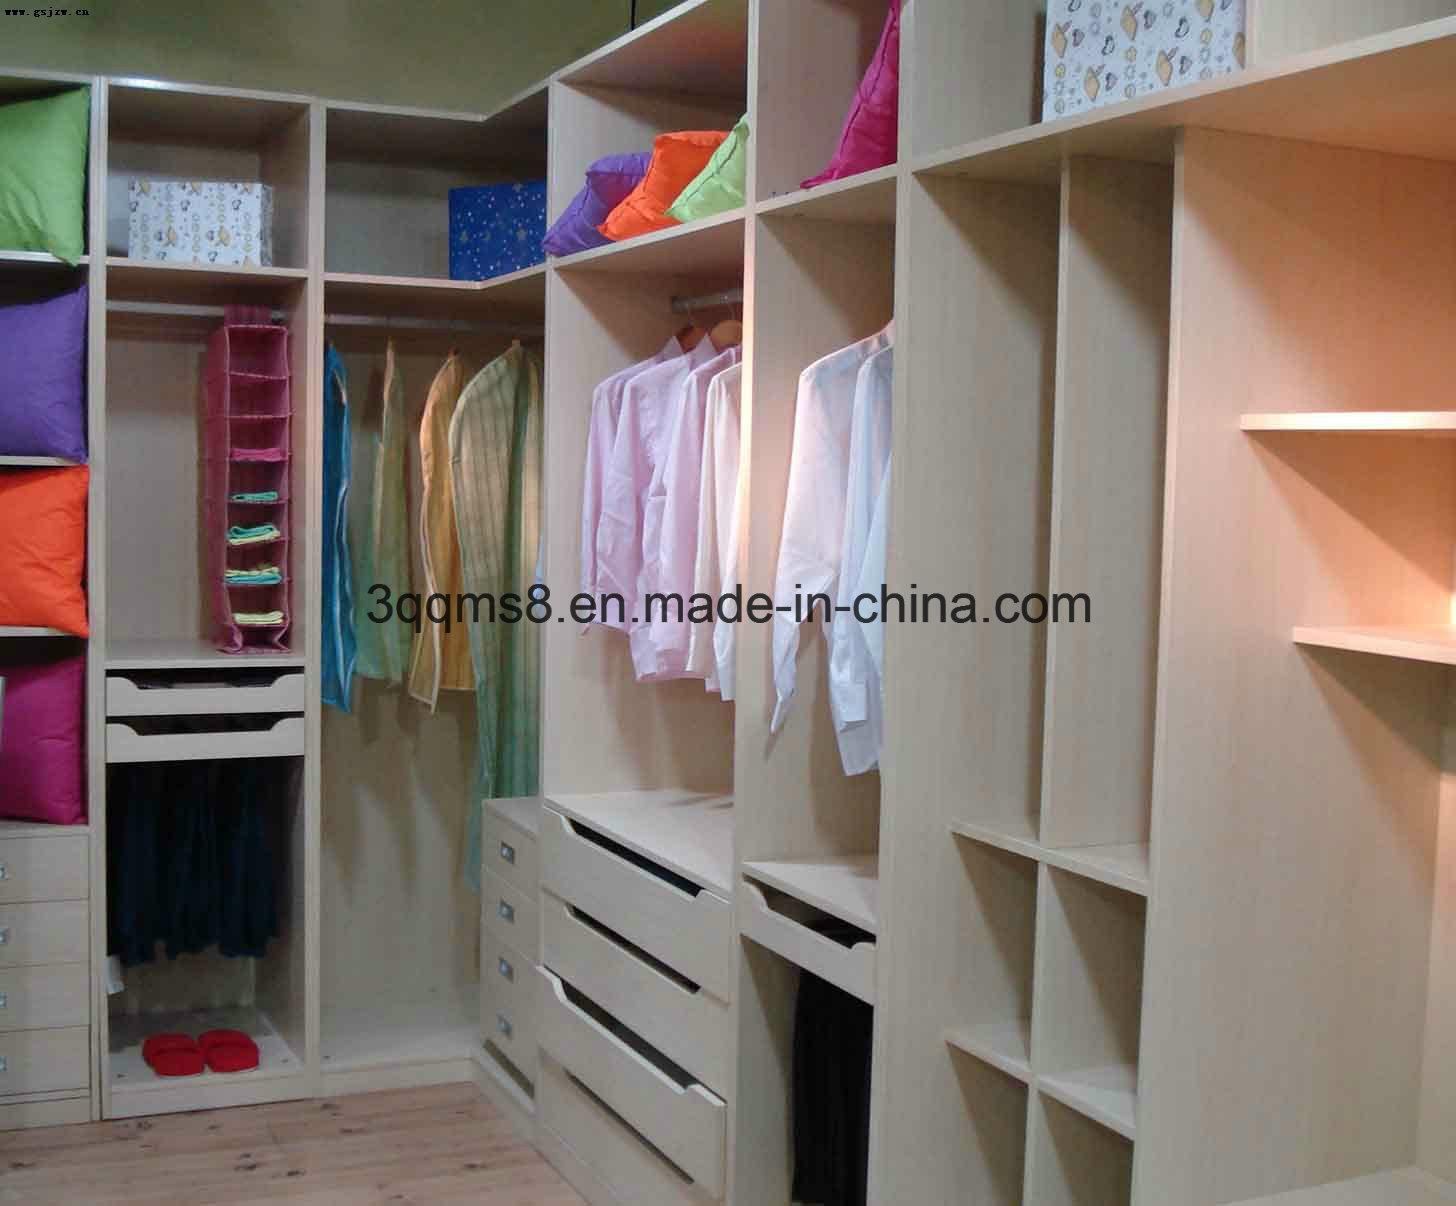 gumtree wood in shelving storage merseyside p wardrobe solid wardrobes liverpool